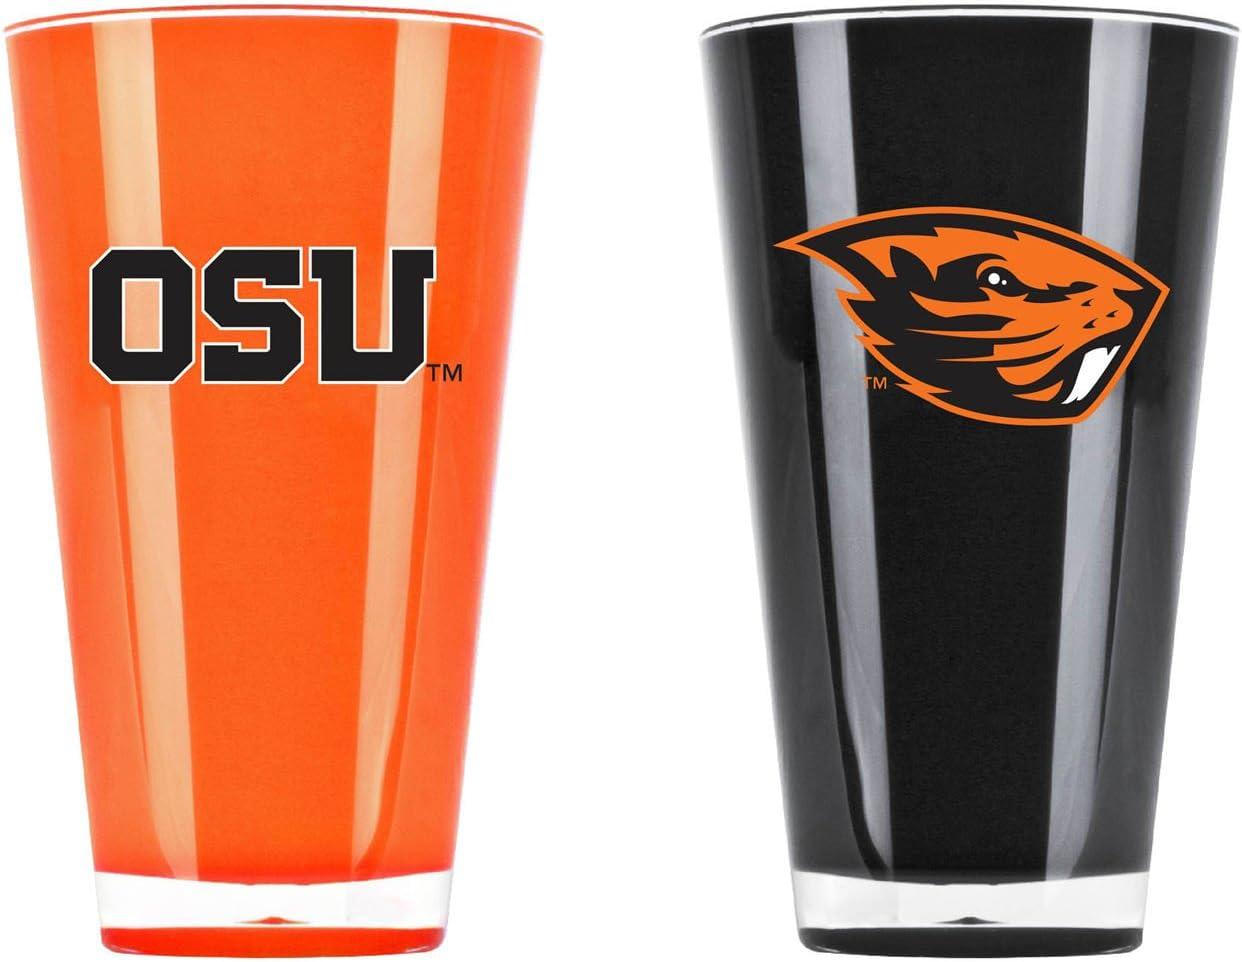 NCAA Oregon State Beavers 20oz Insulated Acrylic Tumbler Set of 2